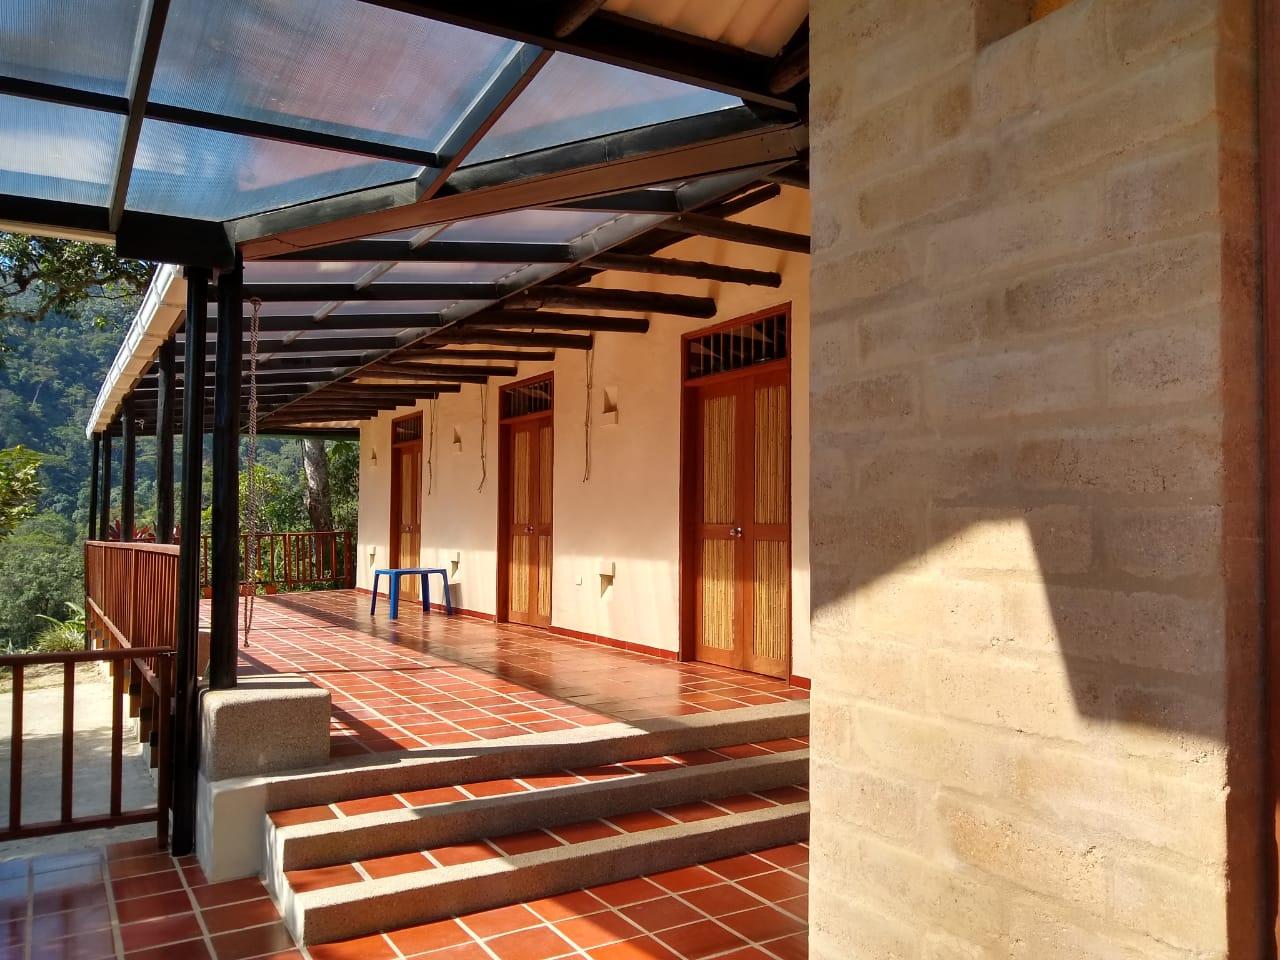 Casa Carolina y Stephanne - La Vega, Cundinamarca2